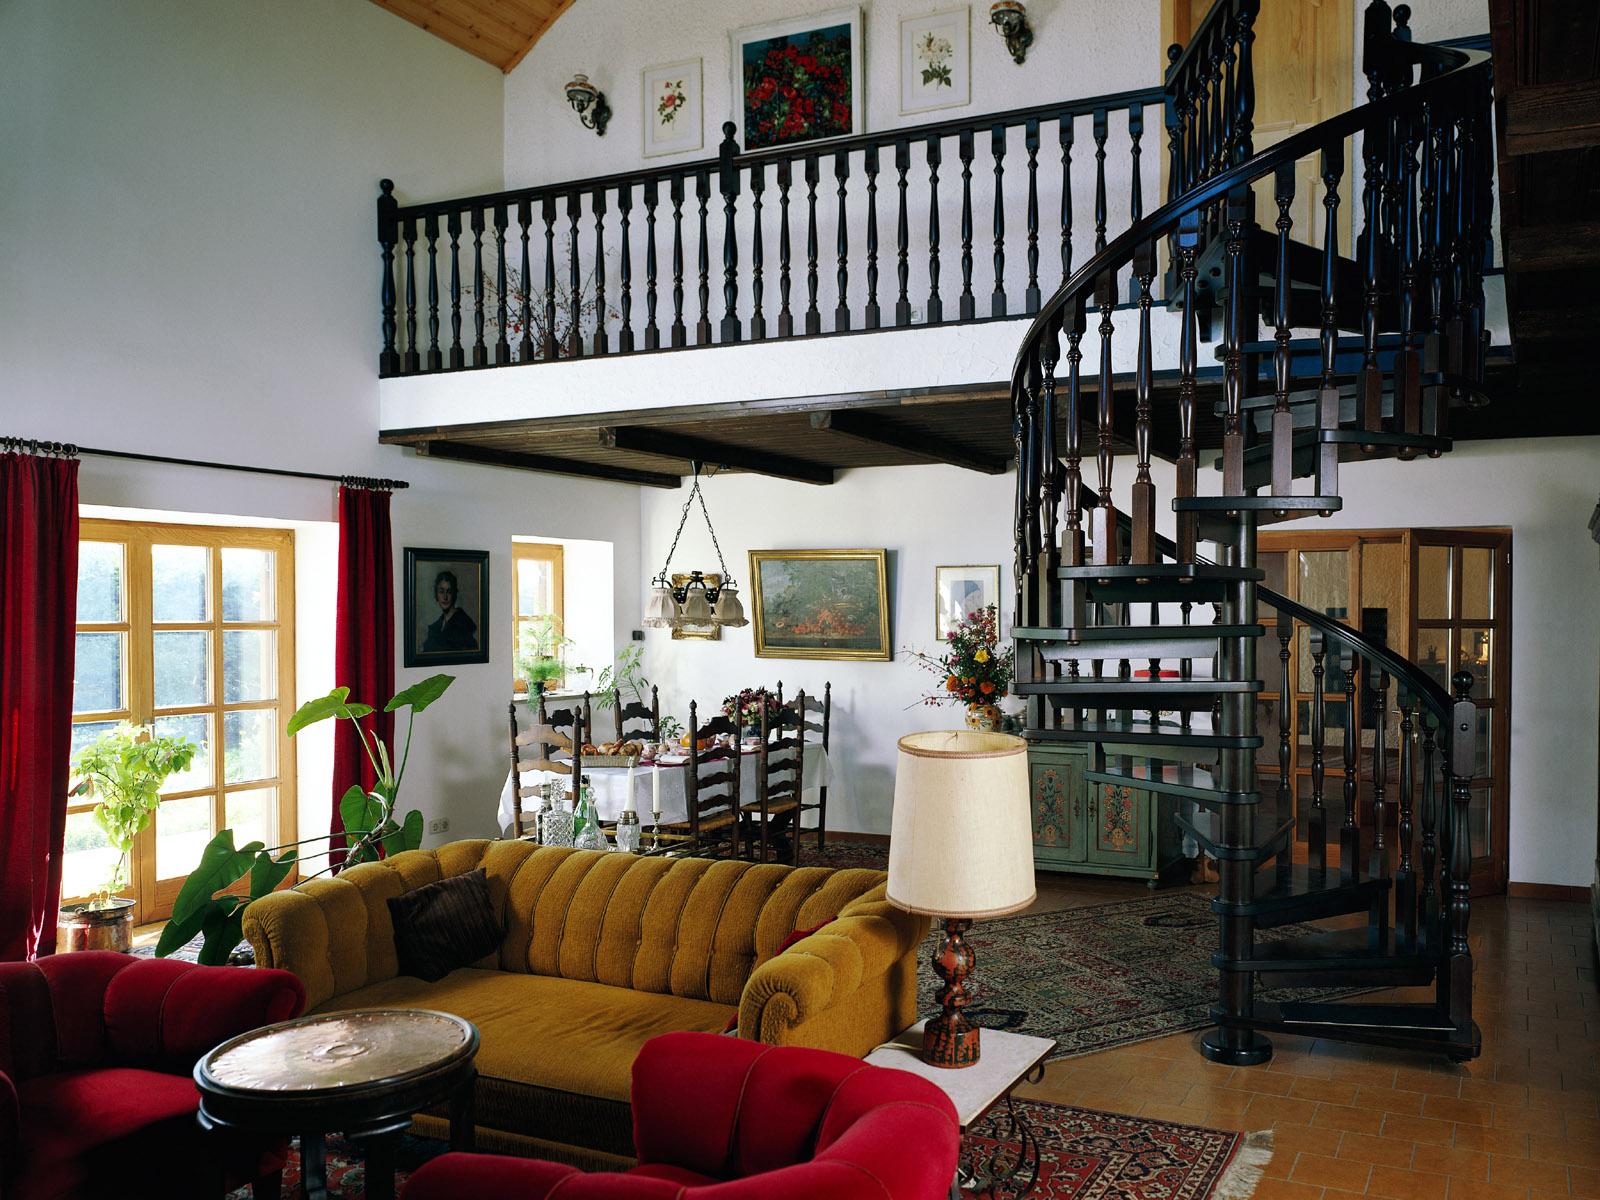 red-sofa-drwaing-room-idea red sofa drwaing room idea